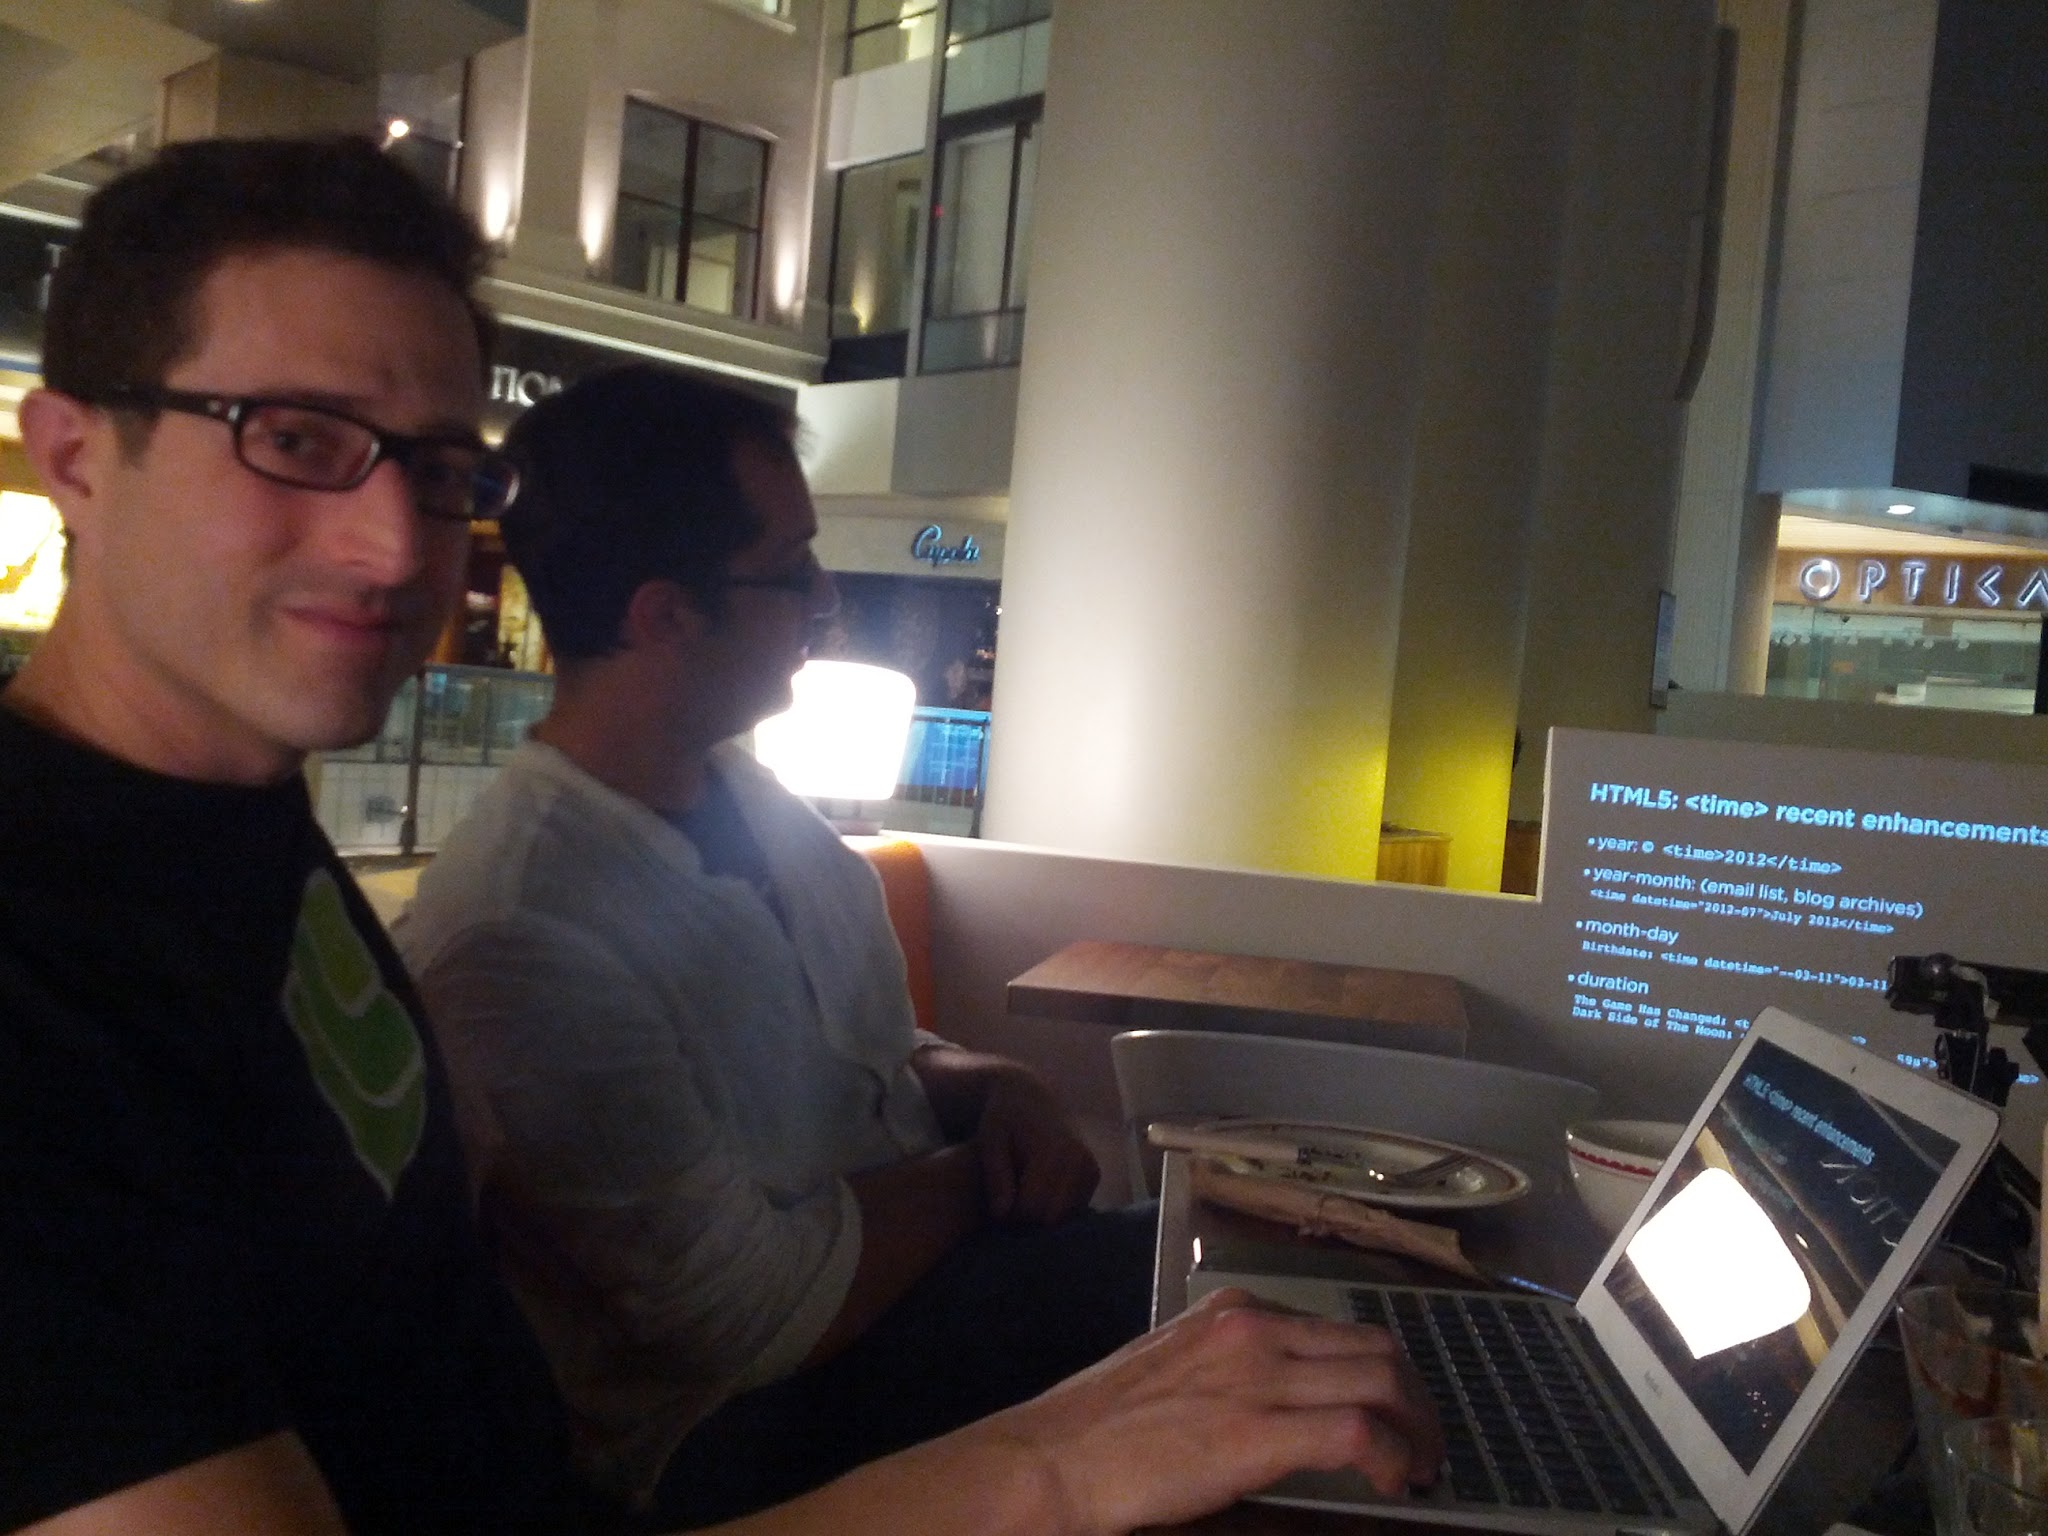 HTML5 & microformats2 meetup - San Francisco